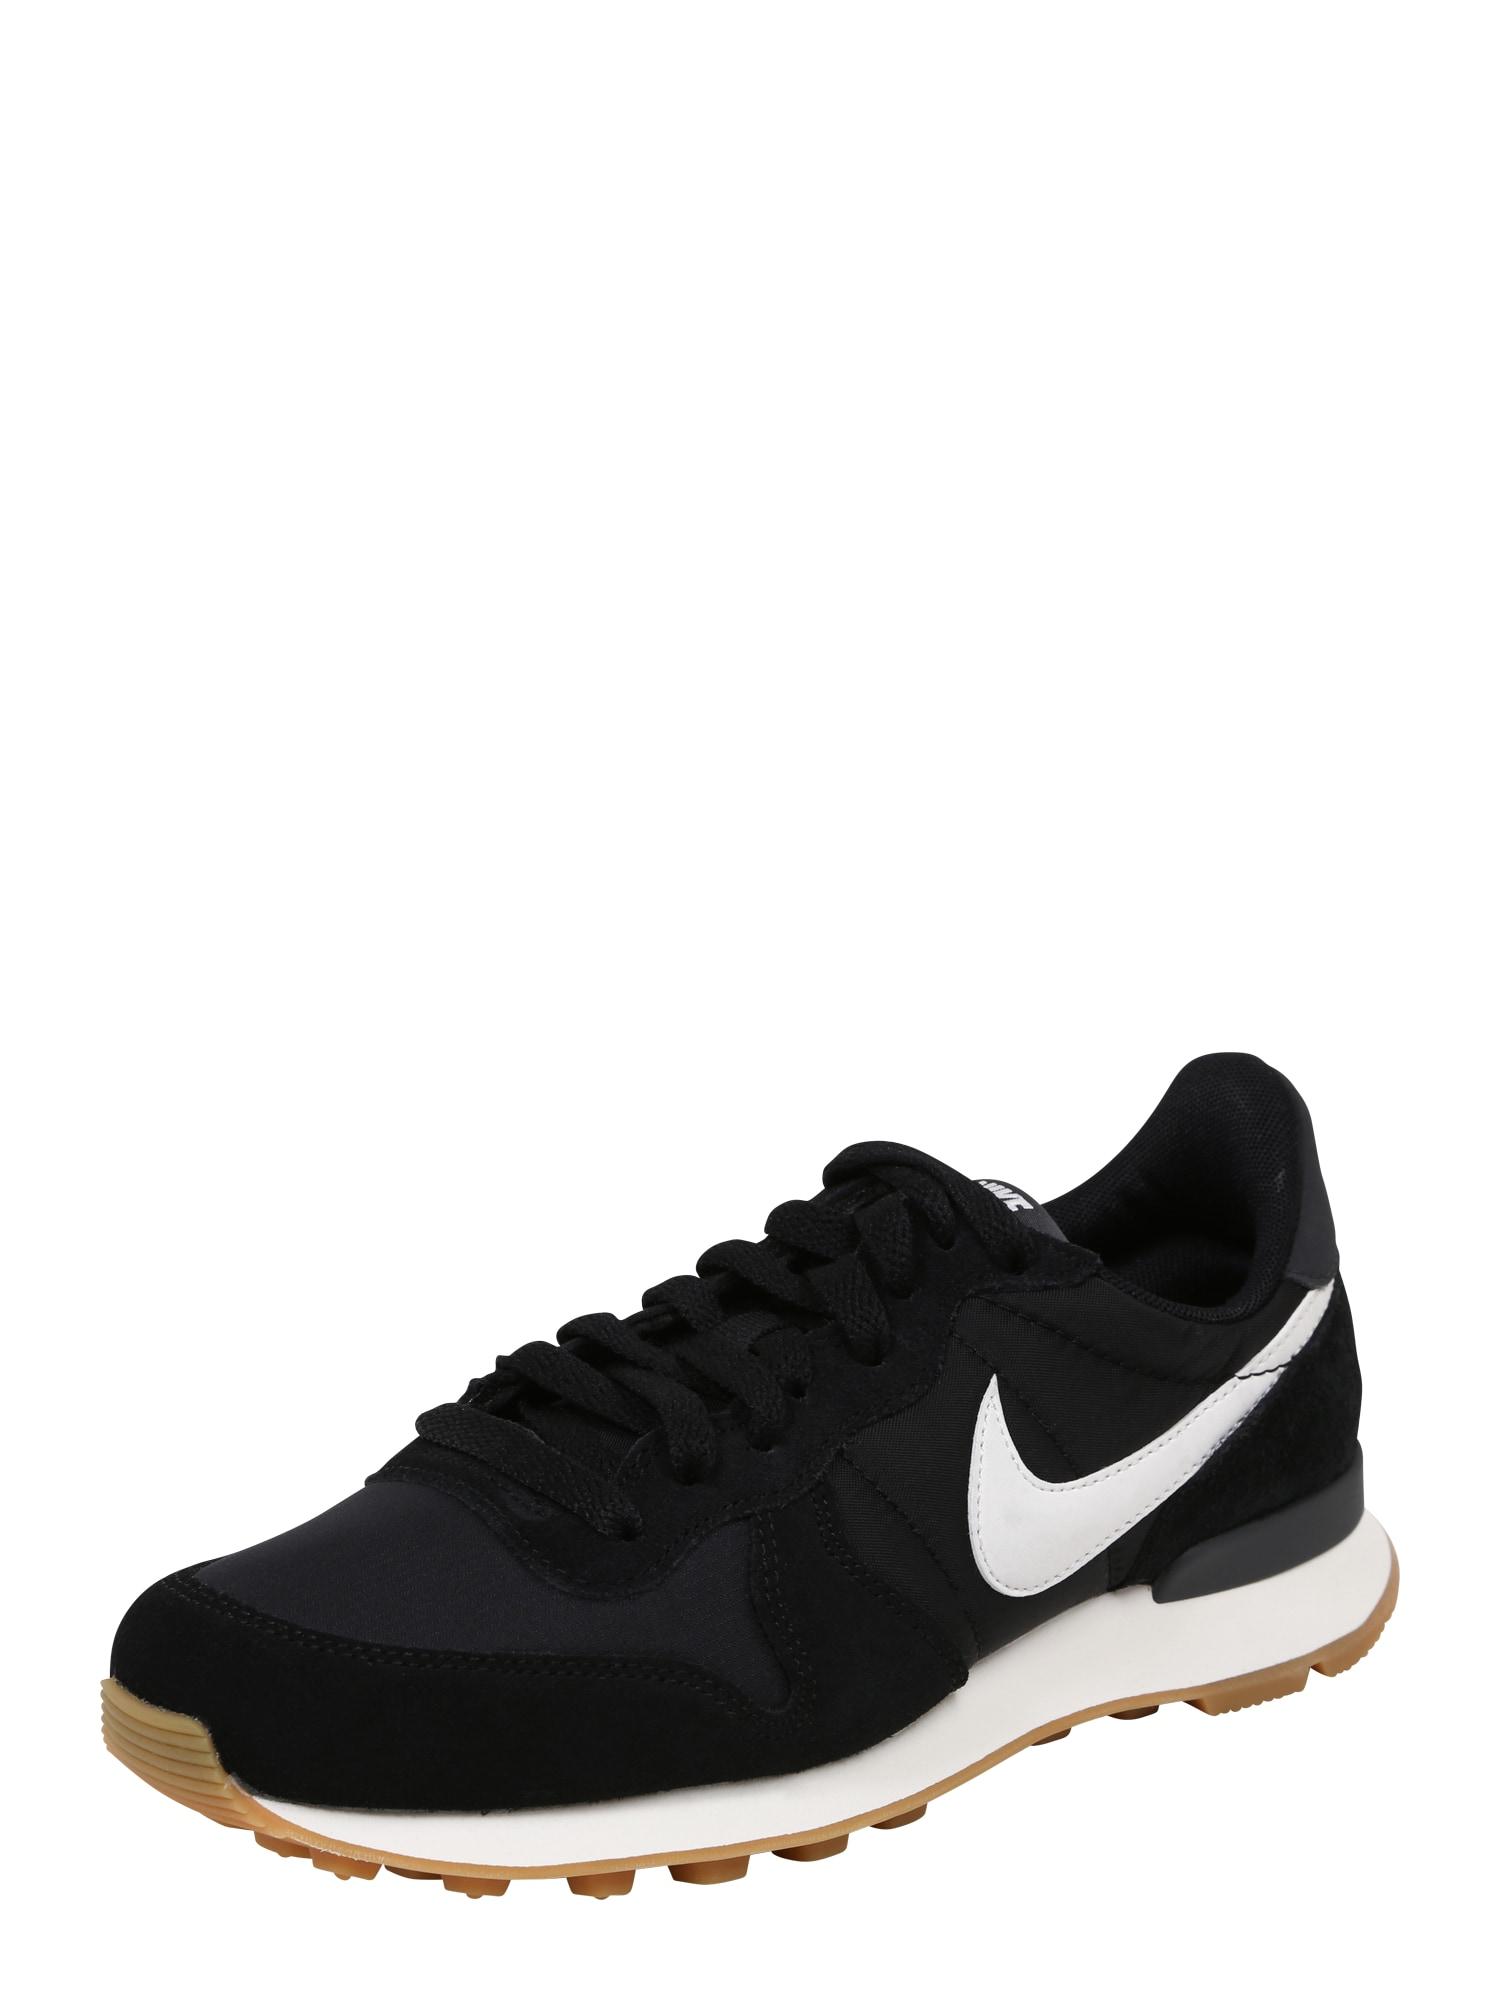 Tenisky Internationalist černá bílá Nike Sportswear